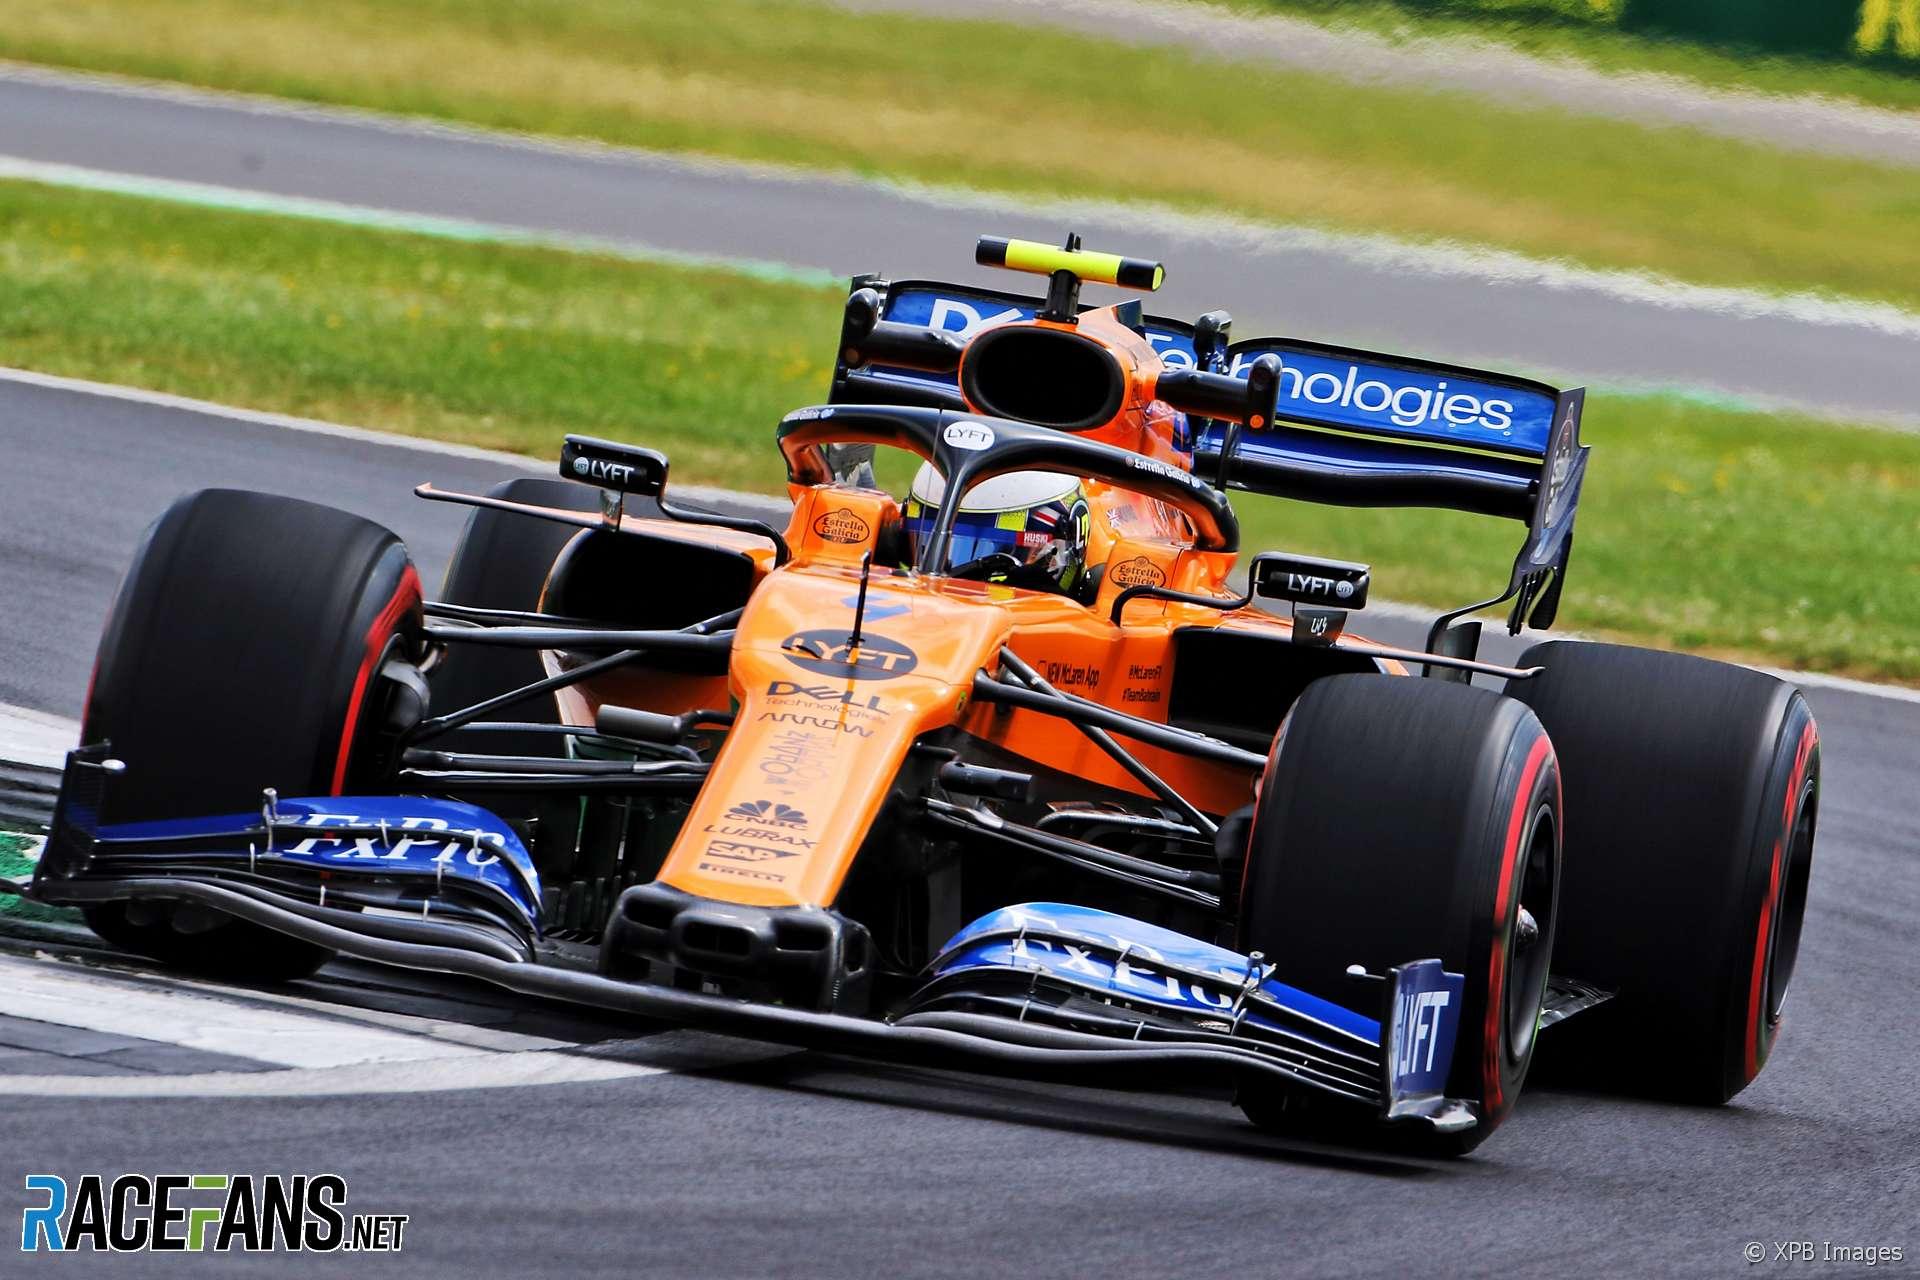 Lando Norris, McLaren, Silverstone, 2019